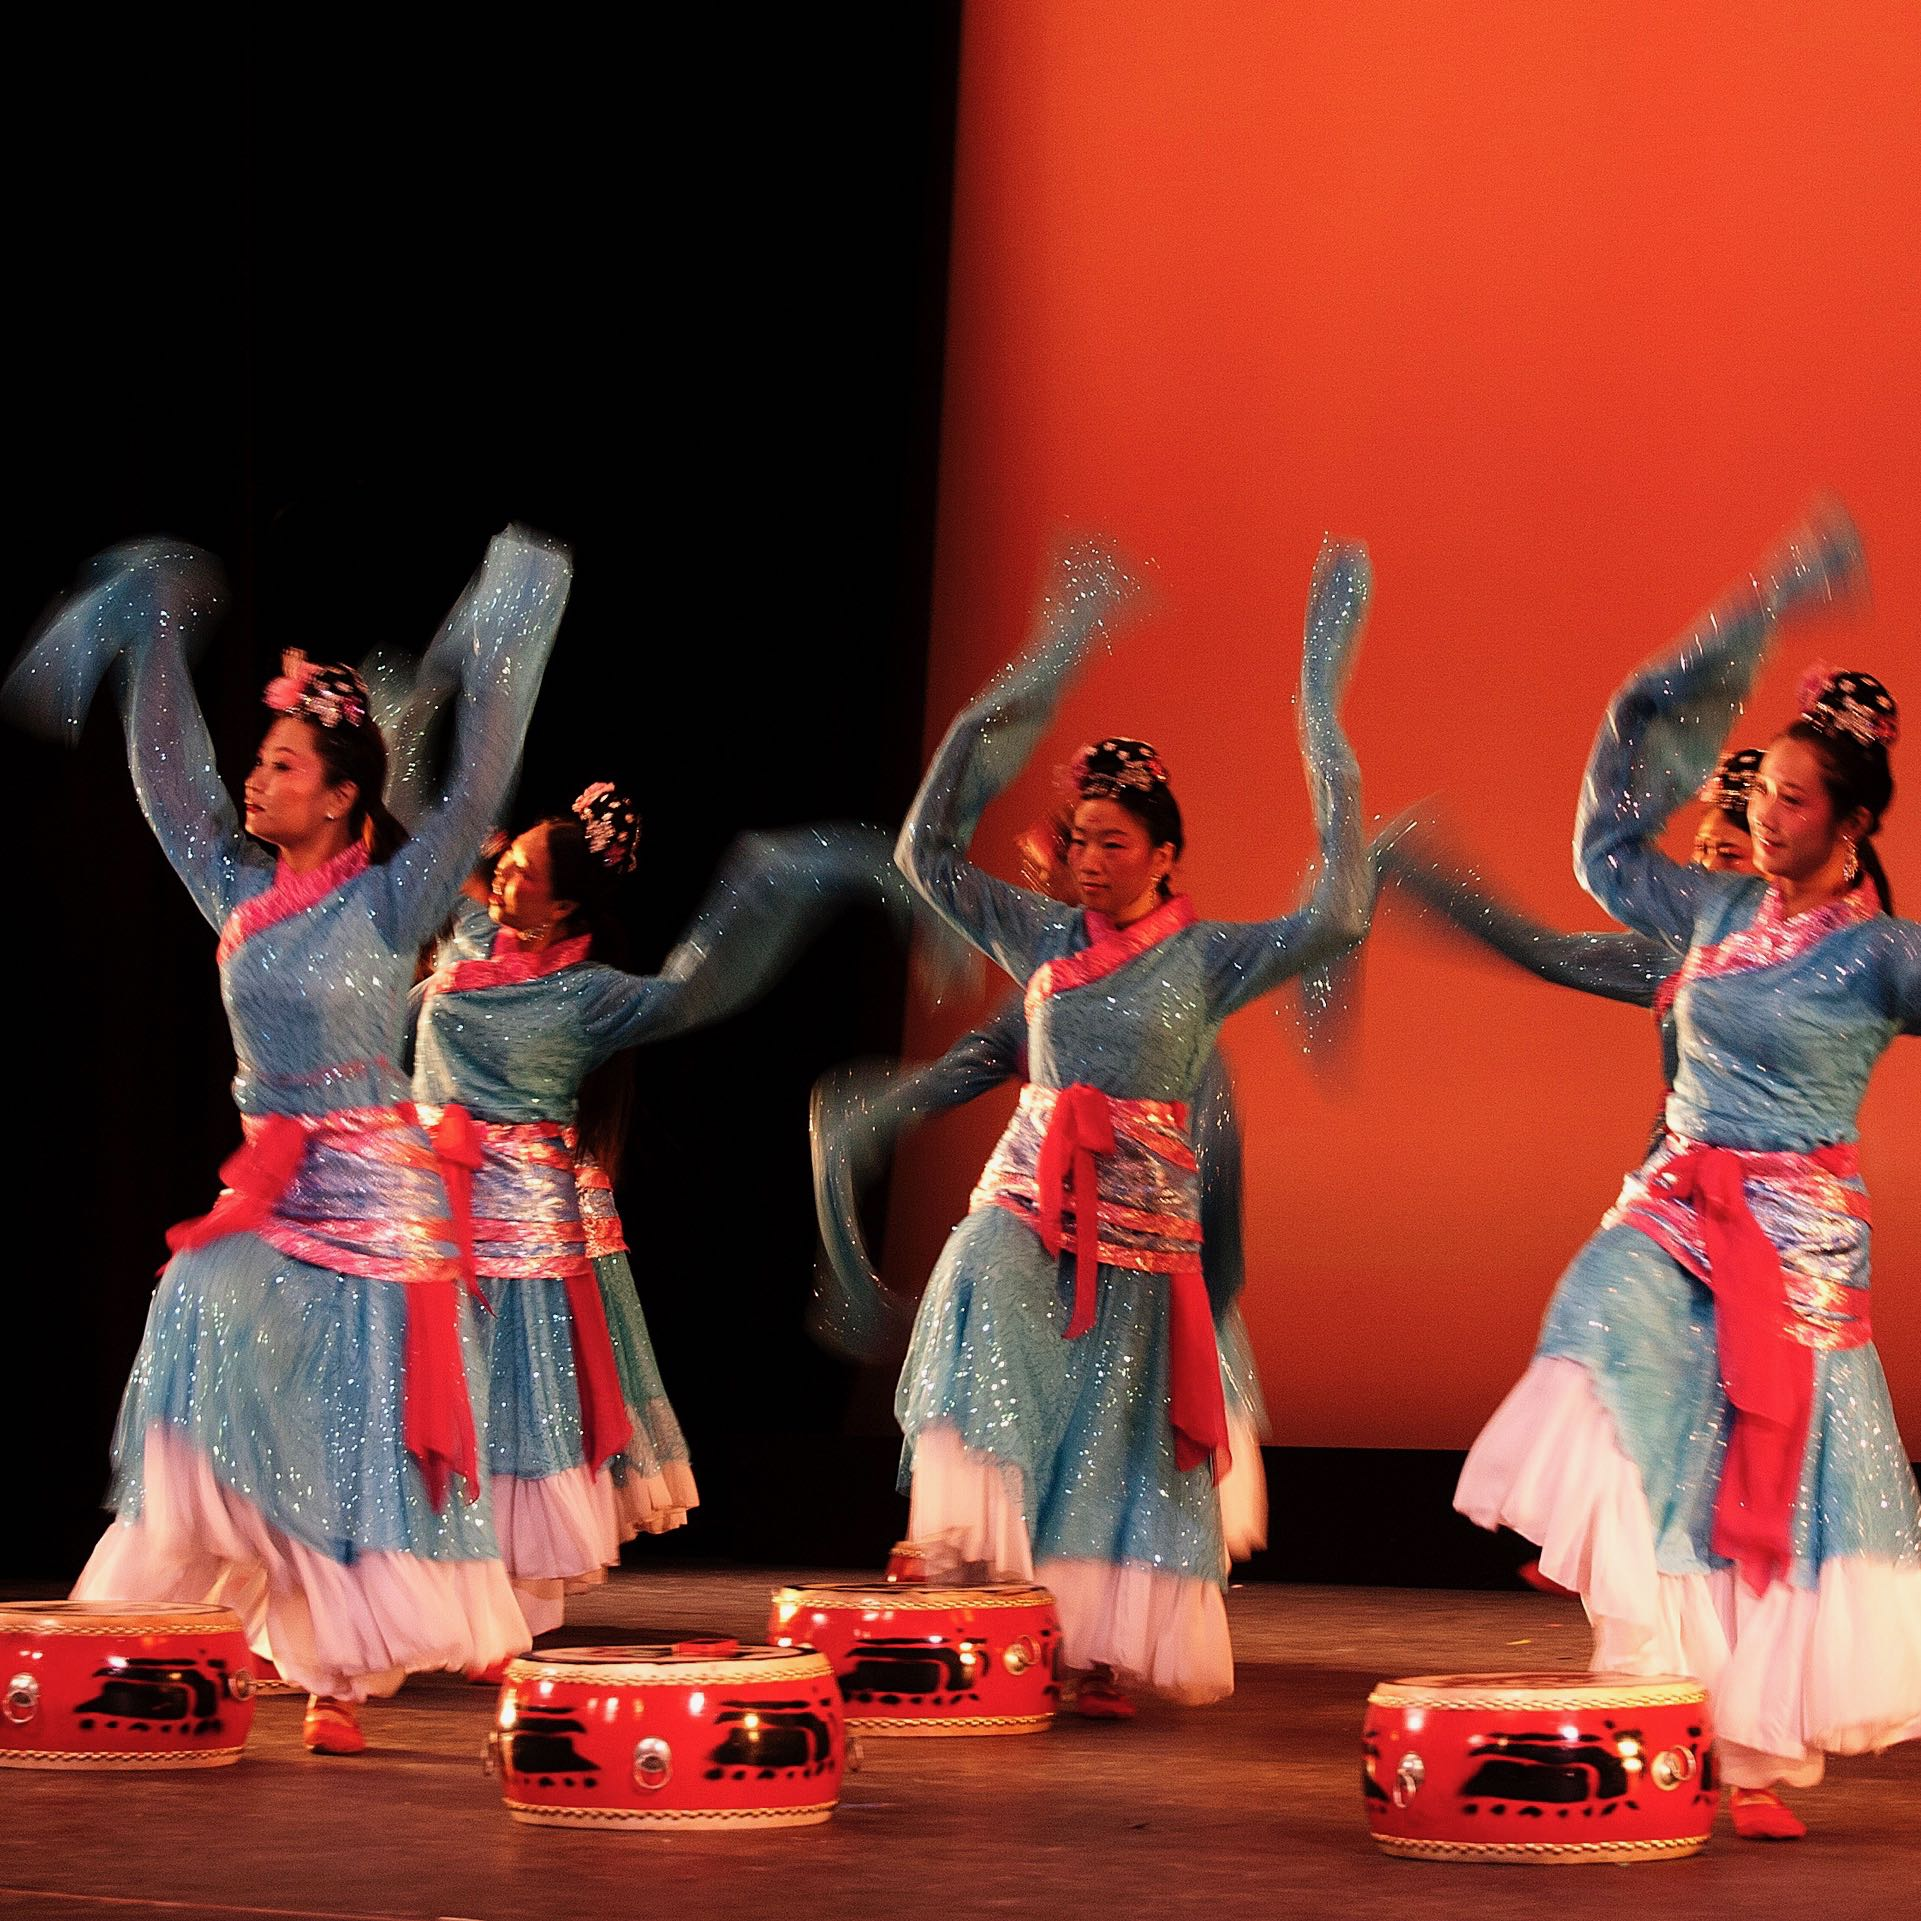 drum-dance-of-the-han-dynasty - 2.jpg